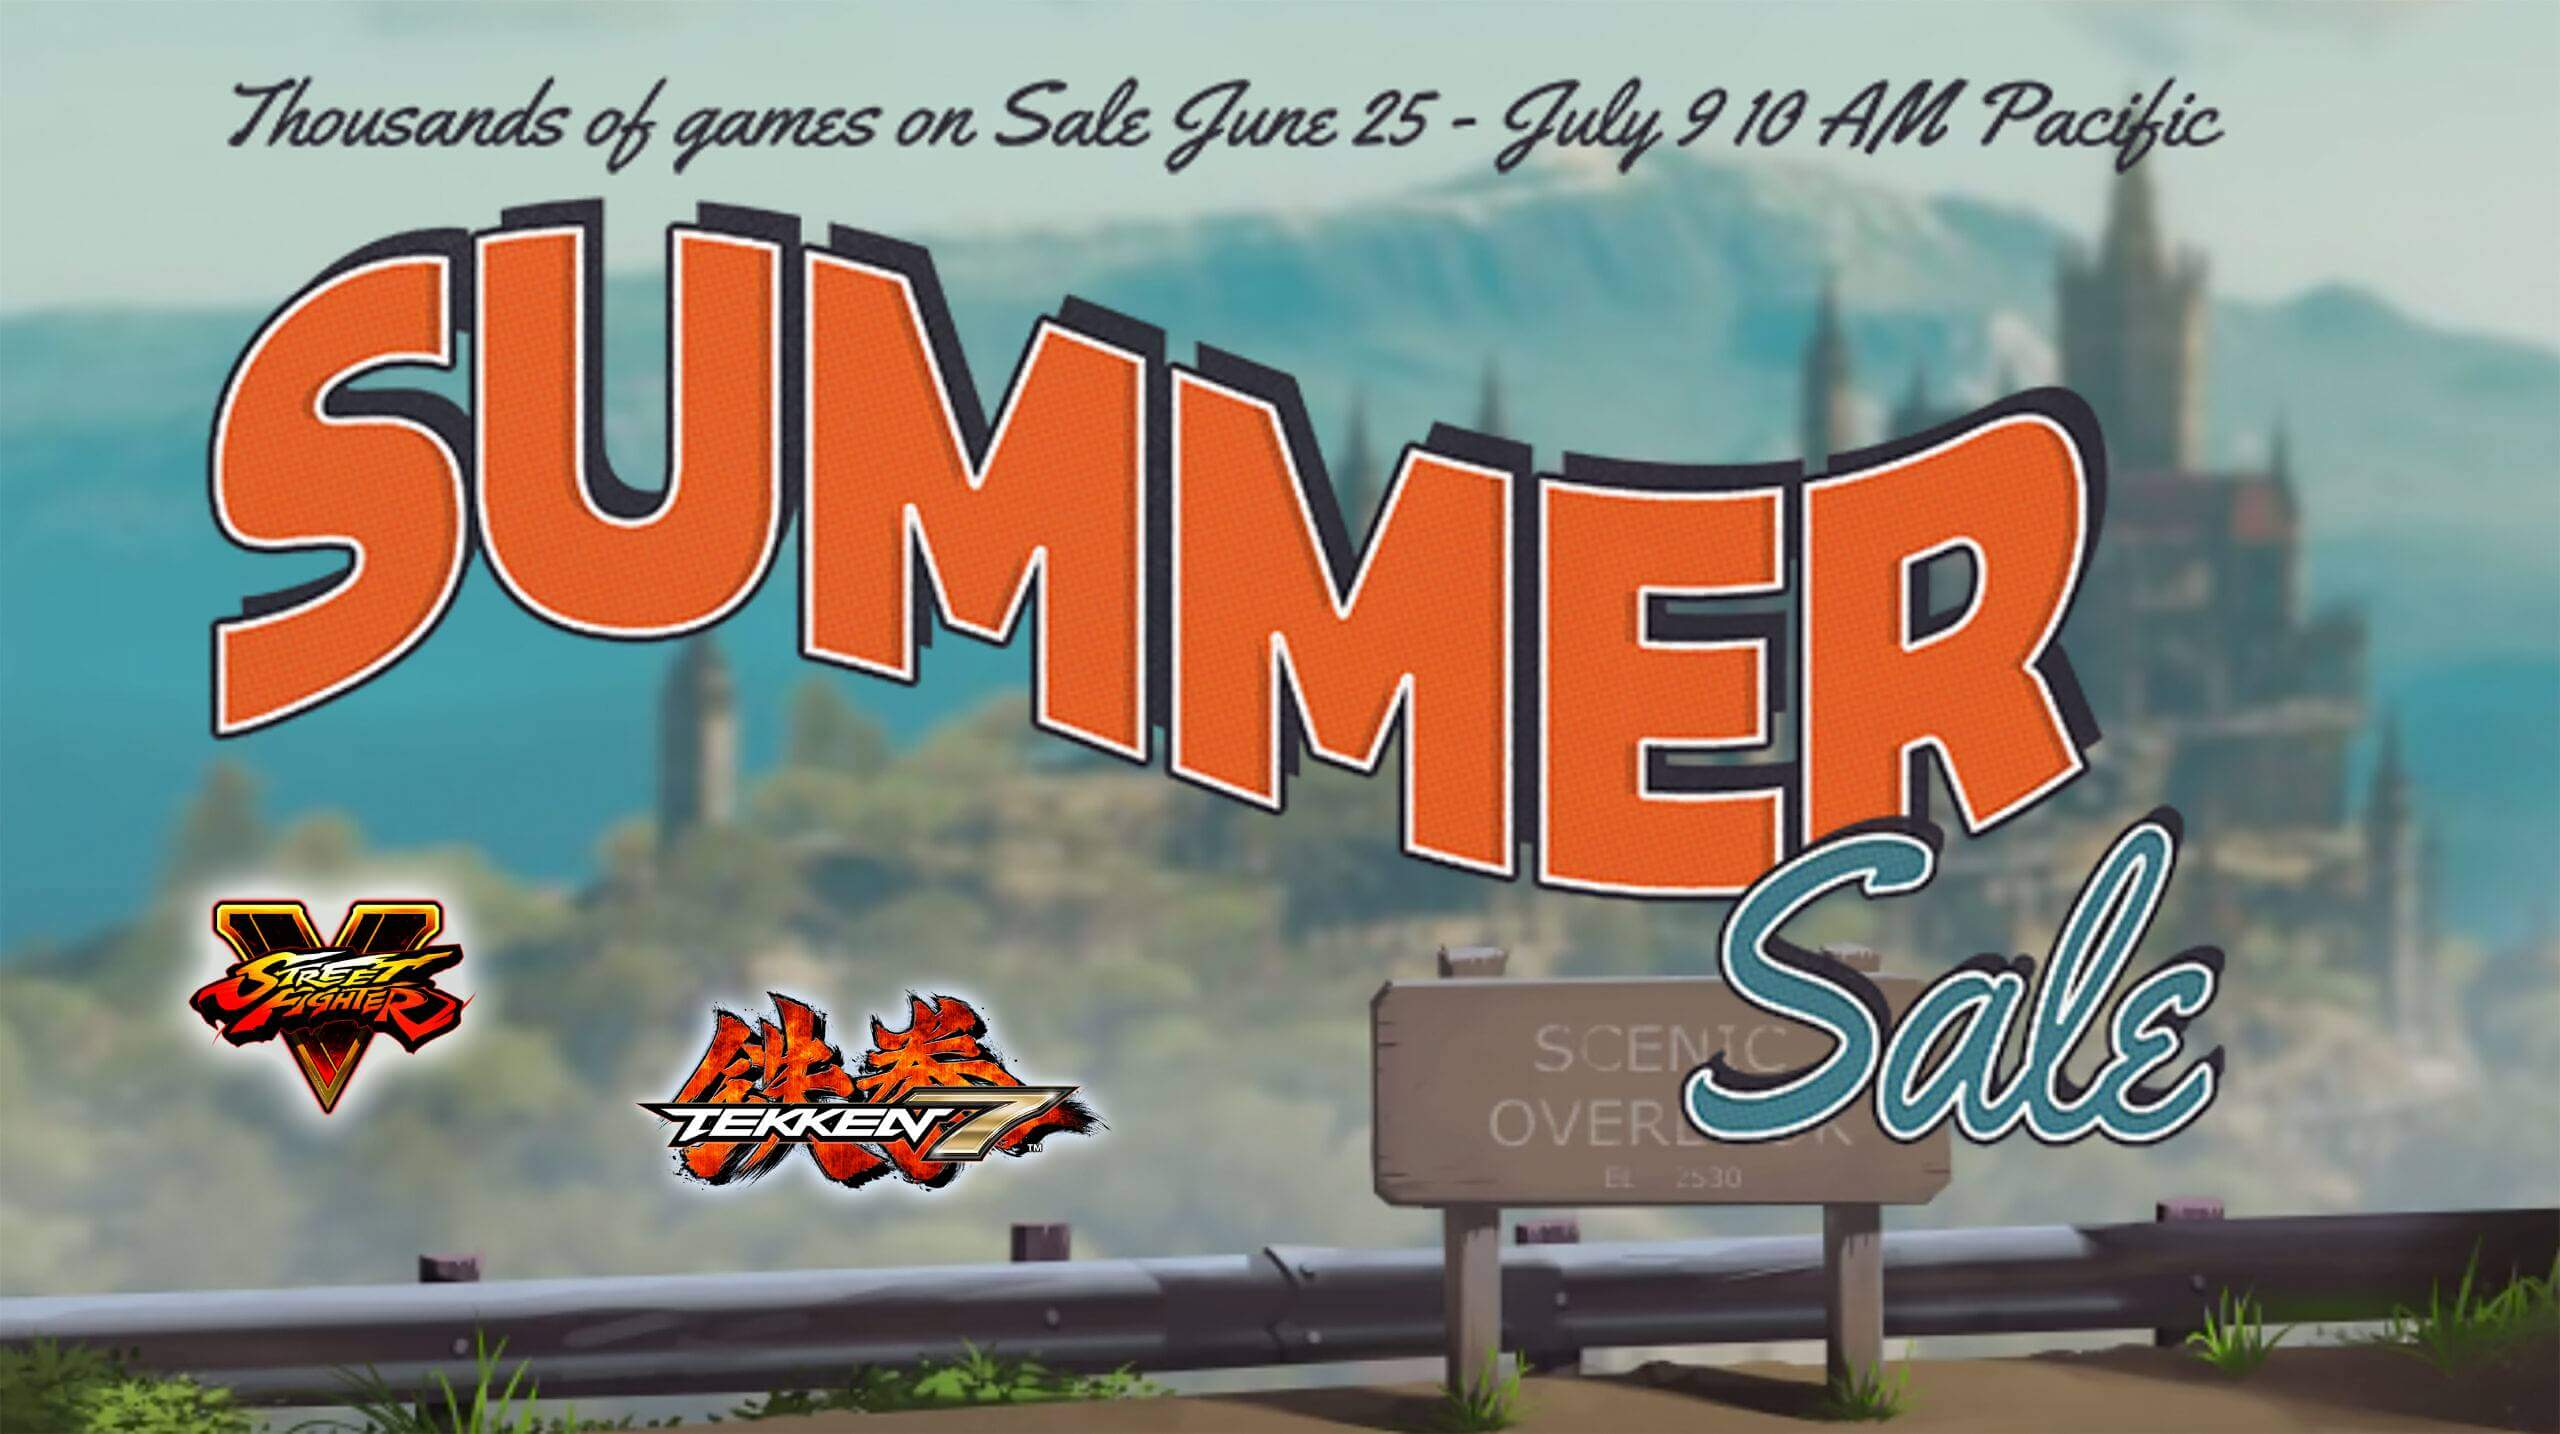 Street Fighter and Tekken are cheap on Steam Summer Sale